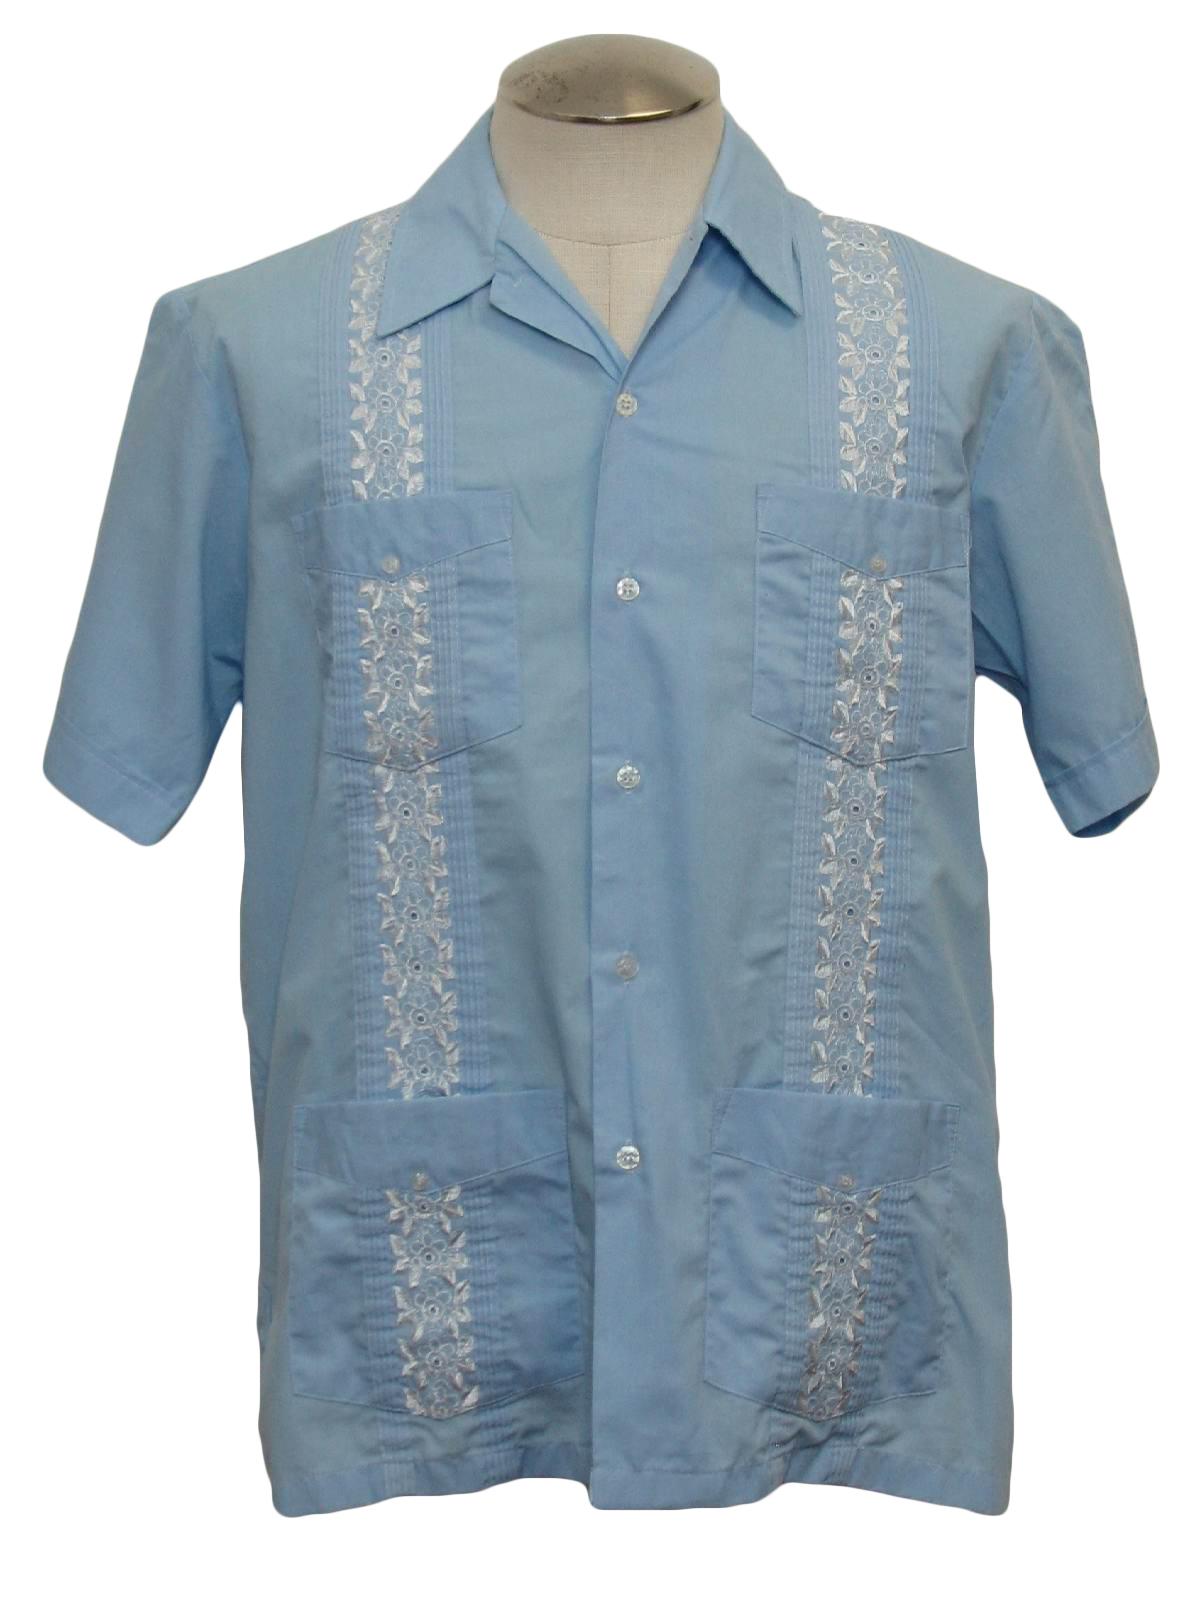 Retro 1980s Guayabera Shirt: 80s -Haband- Mens light blue ...